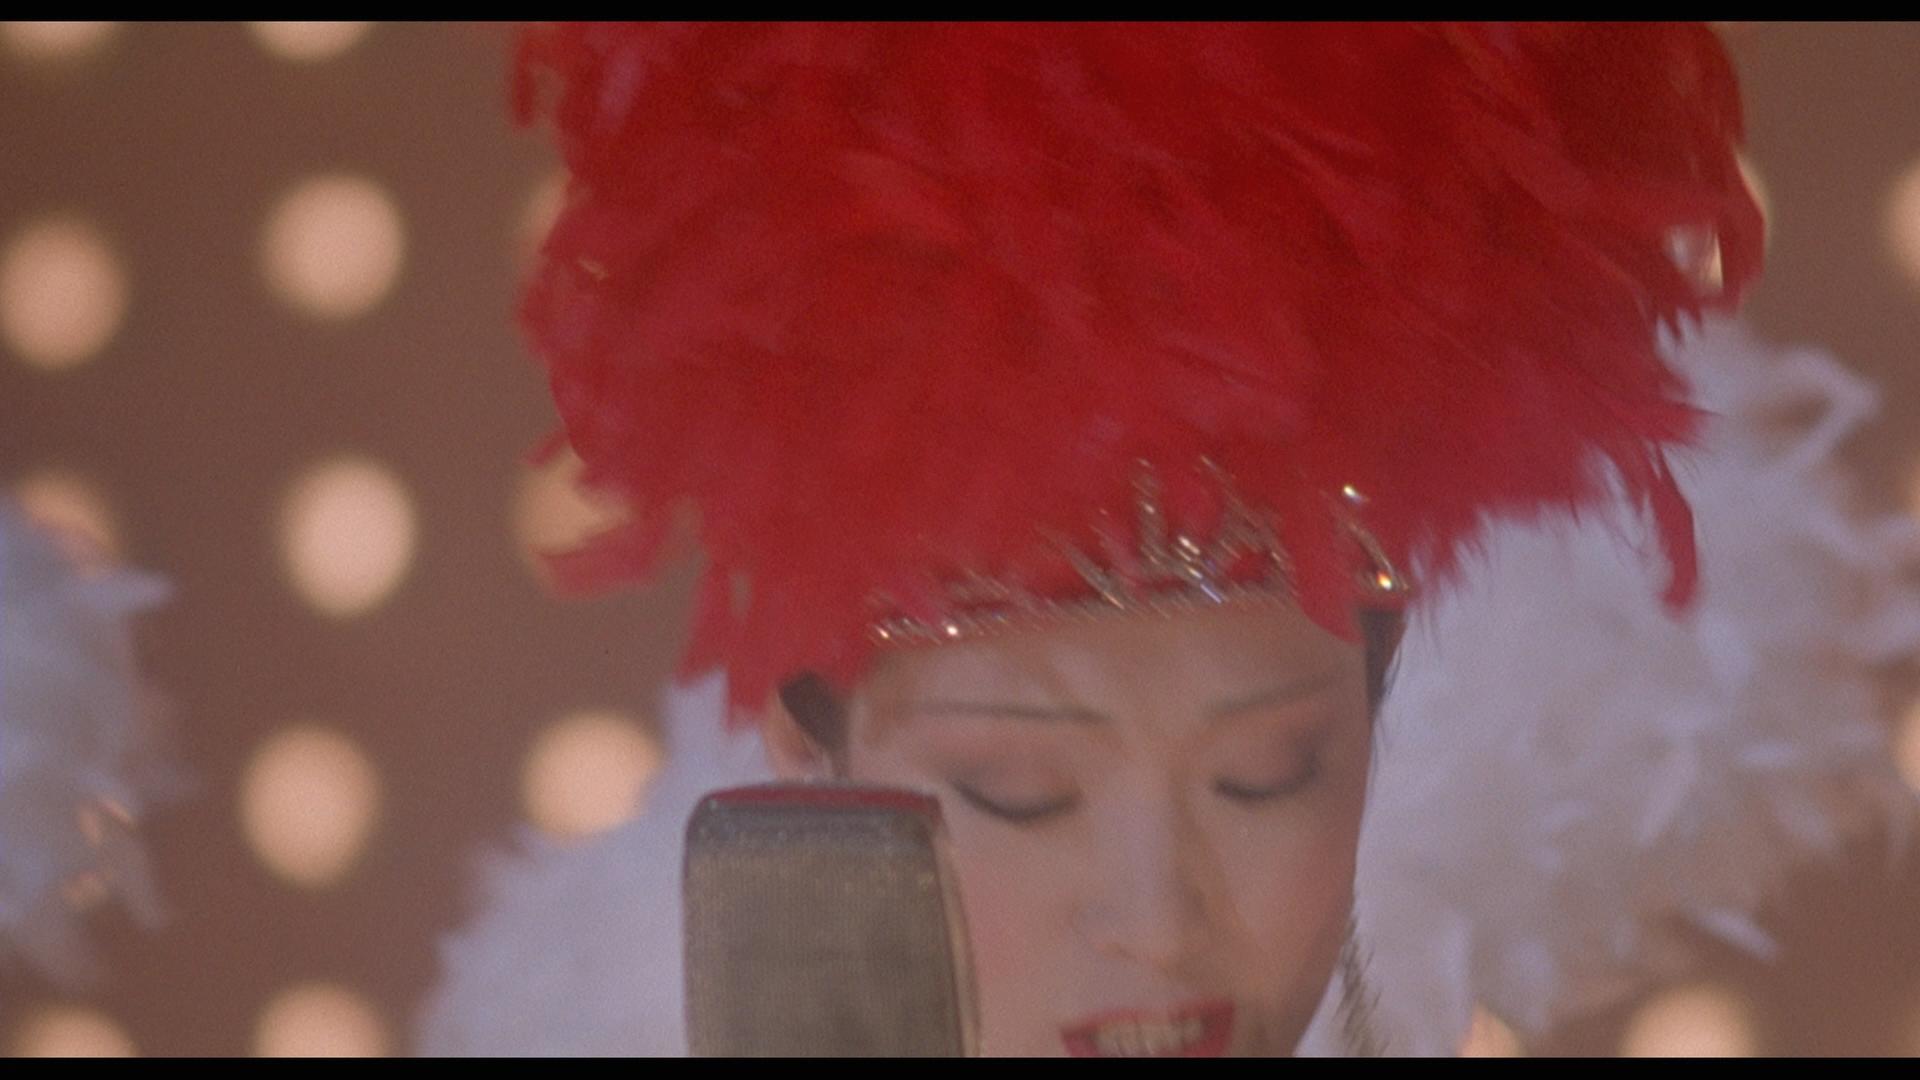 Shanghai Triad [Film Movement Blu-ray review] 5